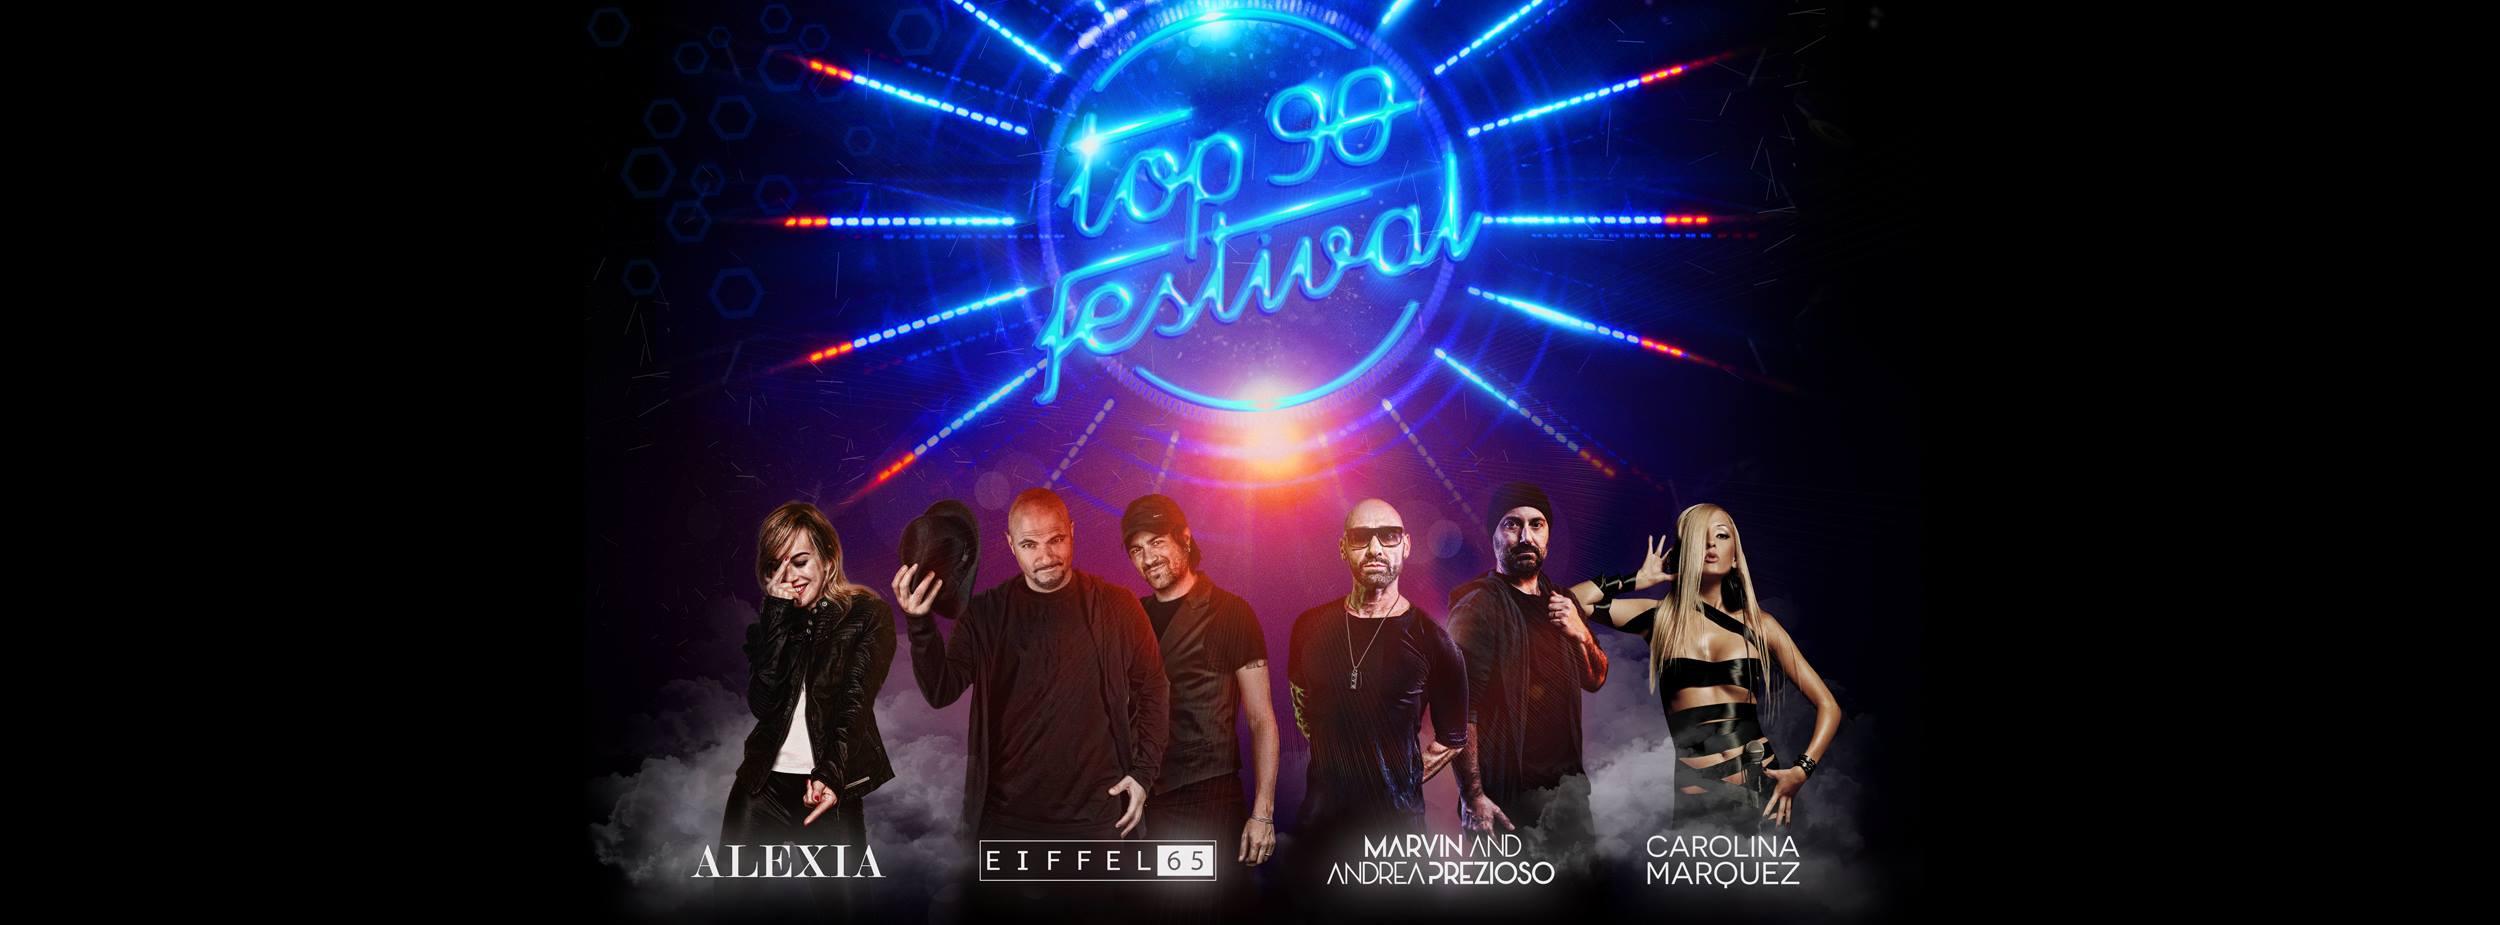 Foto: TOP 90 FESTIVAL – Fabrique Milano